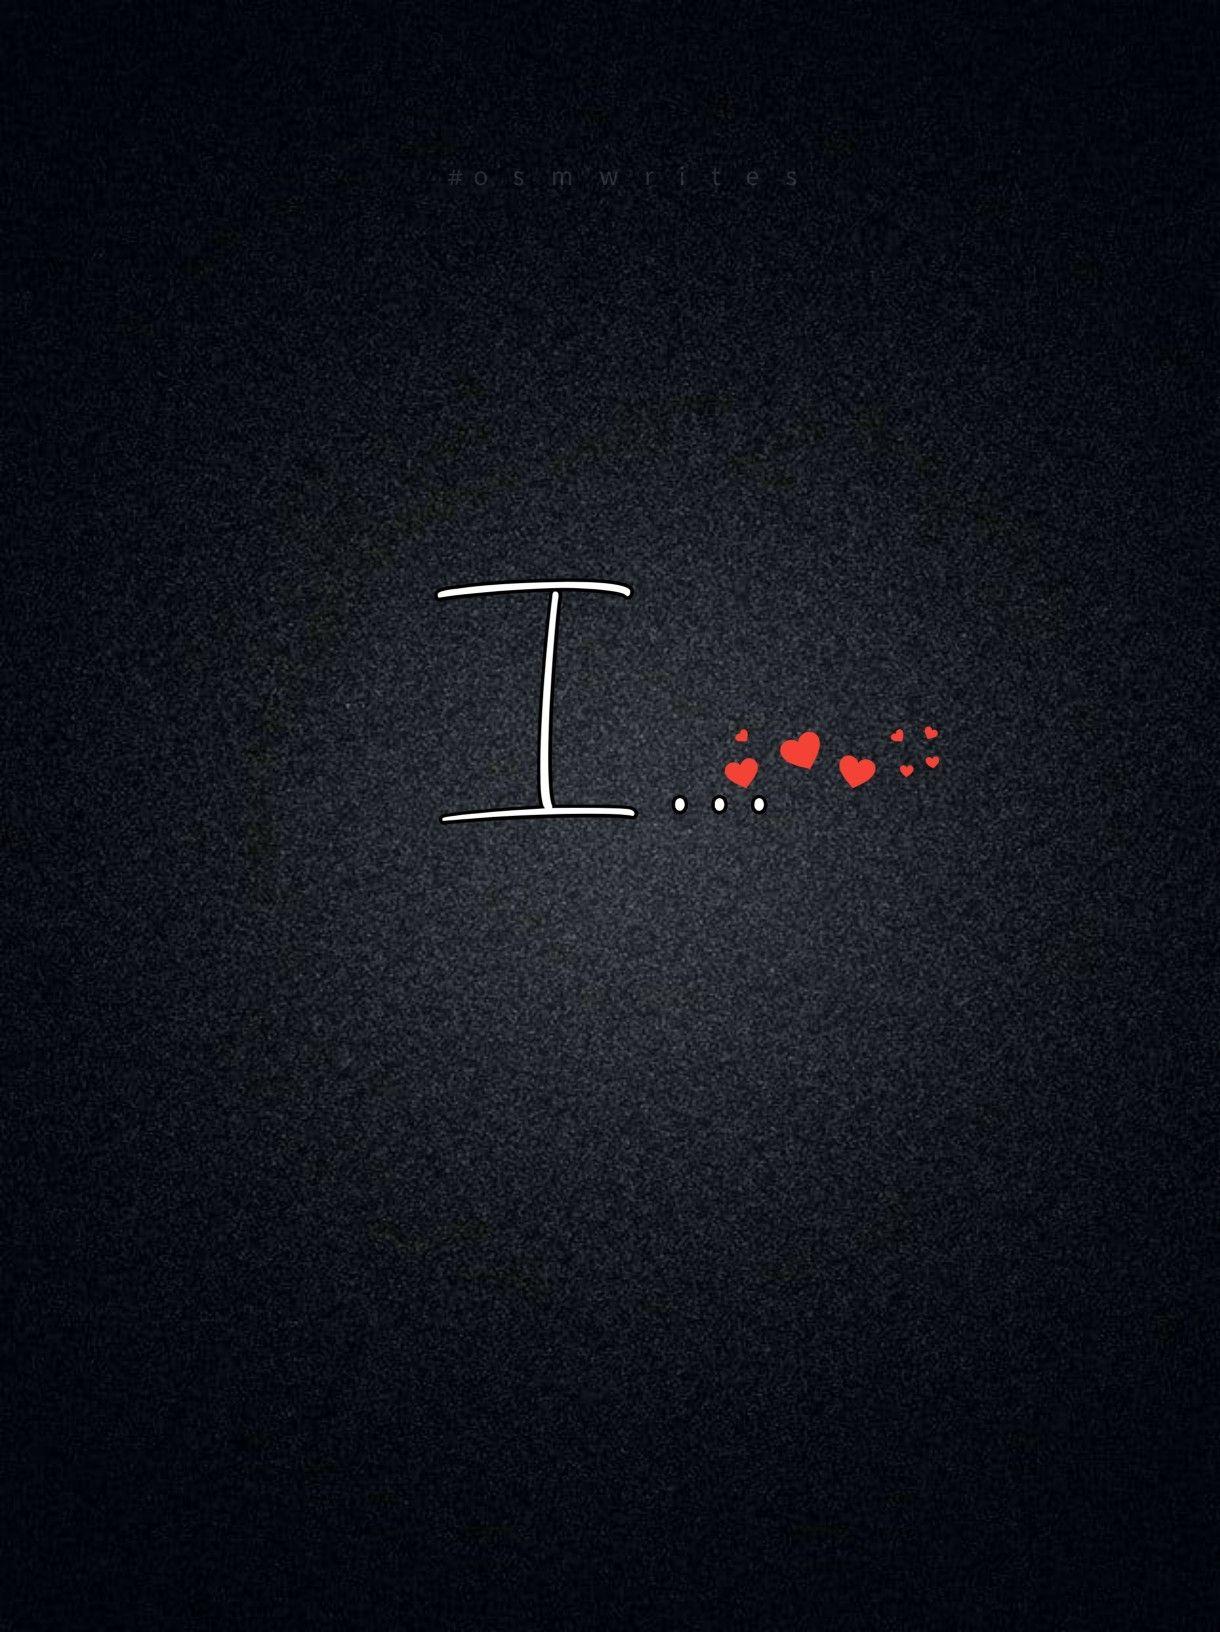 Alphabet I Stylish Alphabet Wallpaper For ur Phones ️ ️